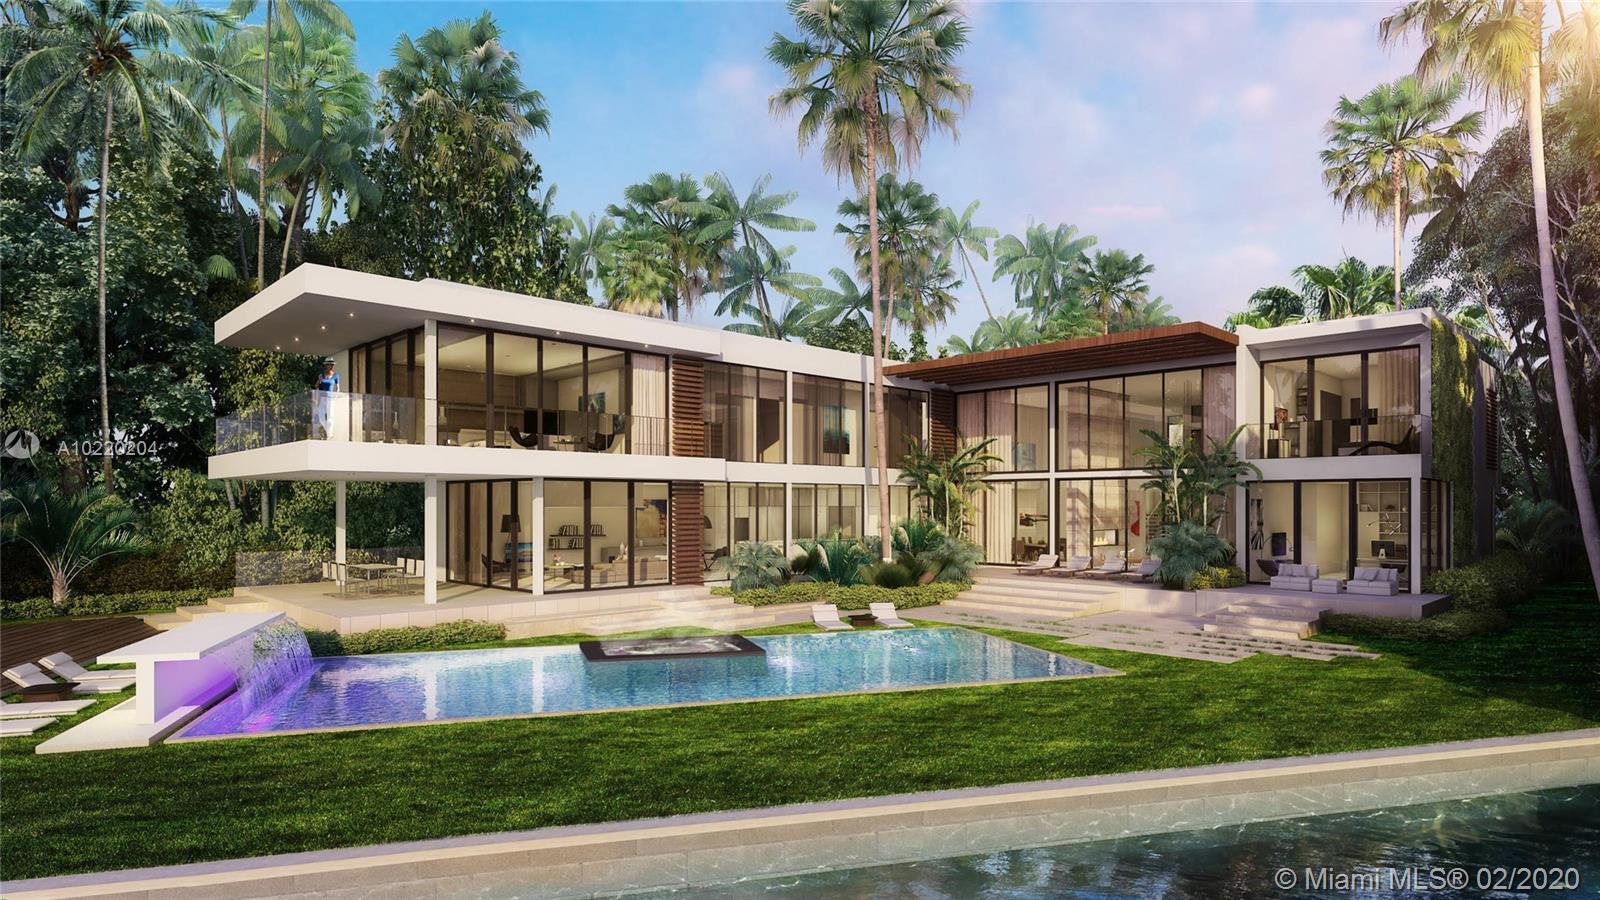 580  Sabal Palm Rd  For Sale A10220204, FL